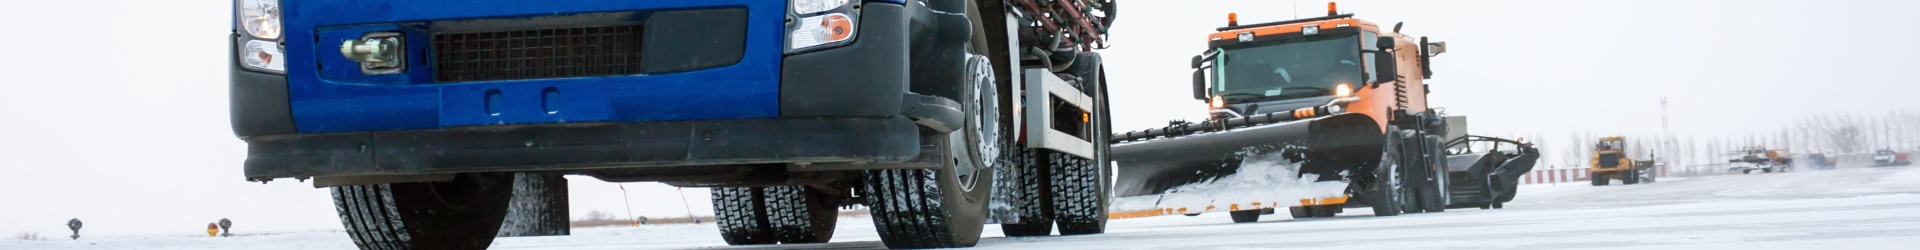 Stuursystemen voor luchthavenuitrusting